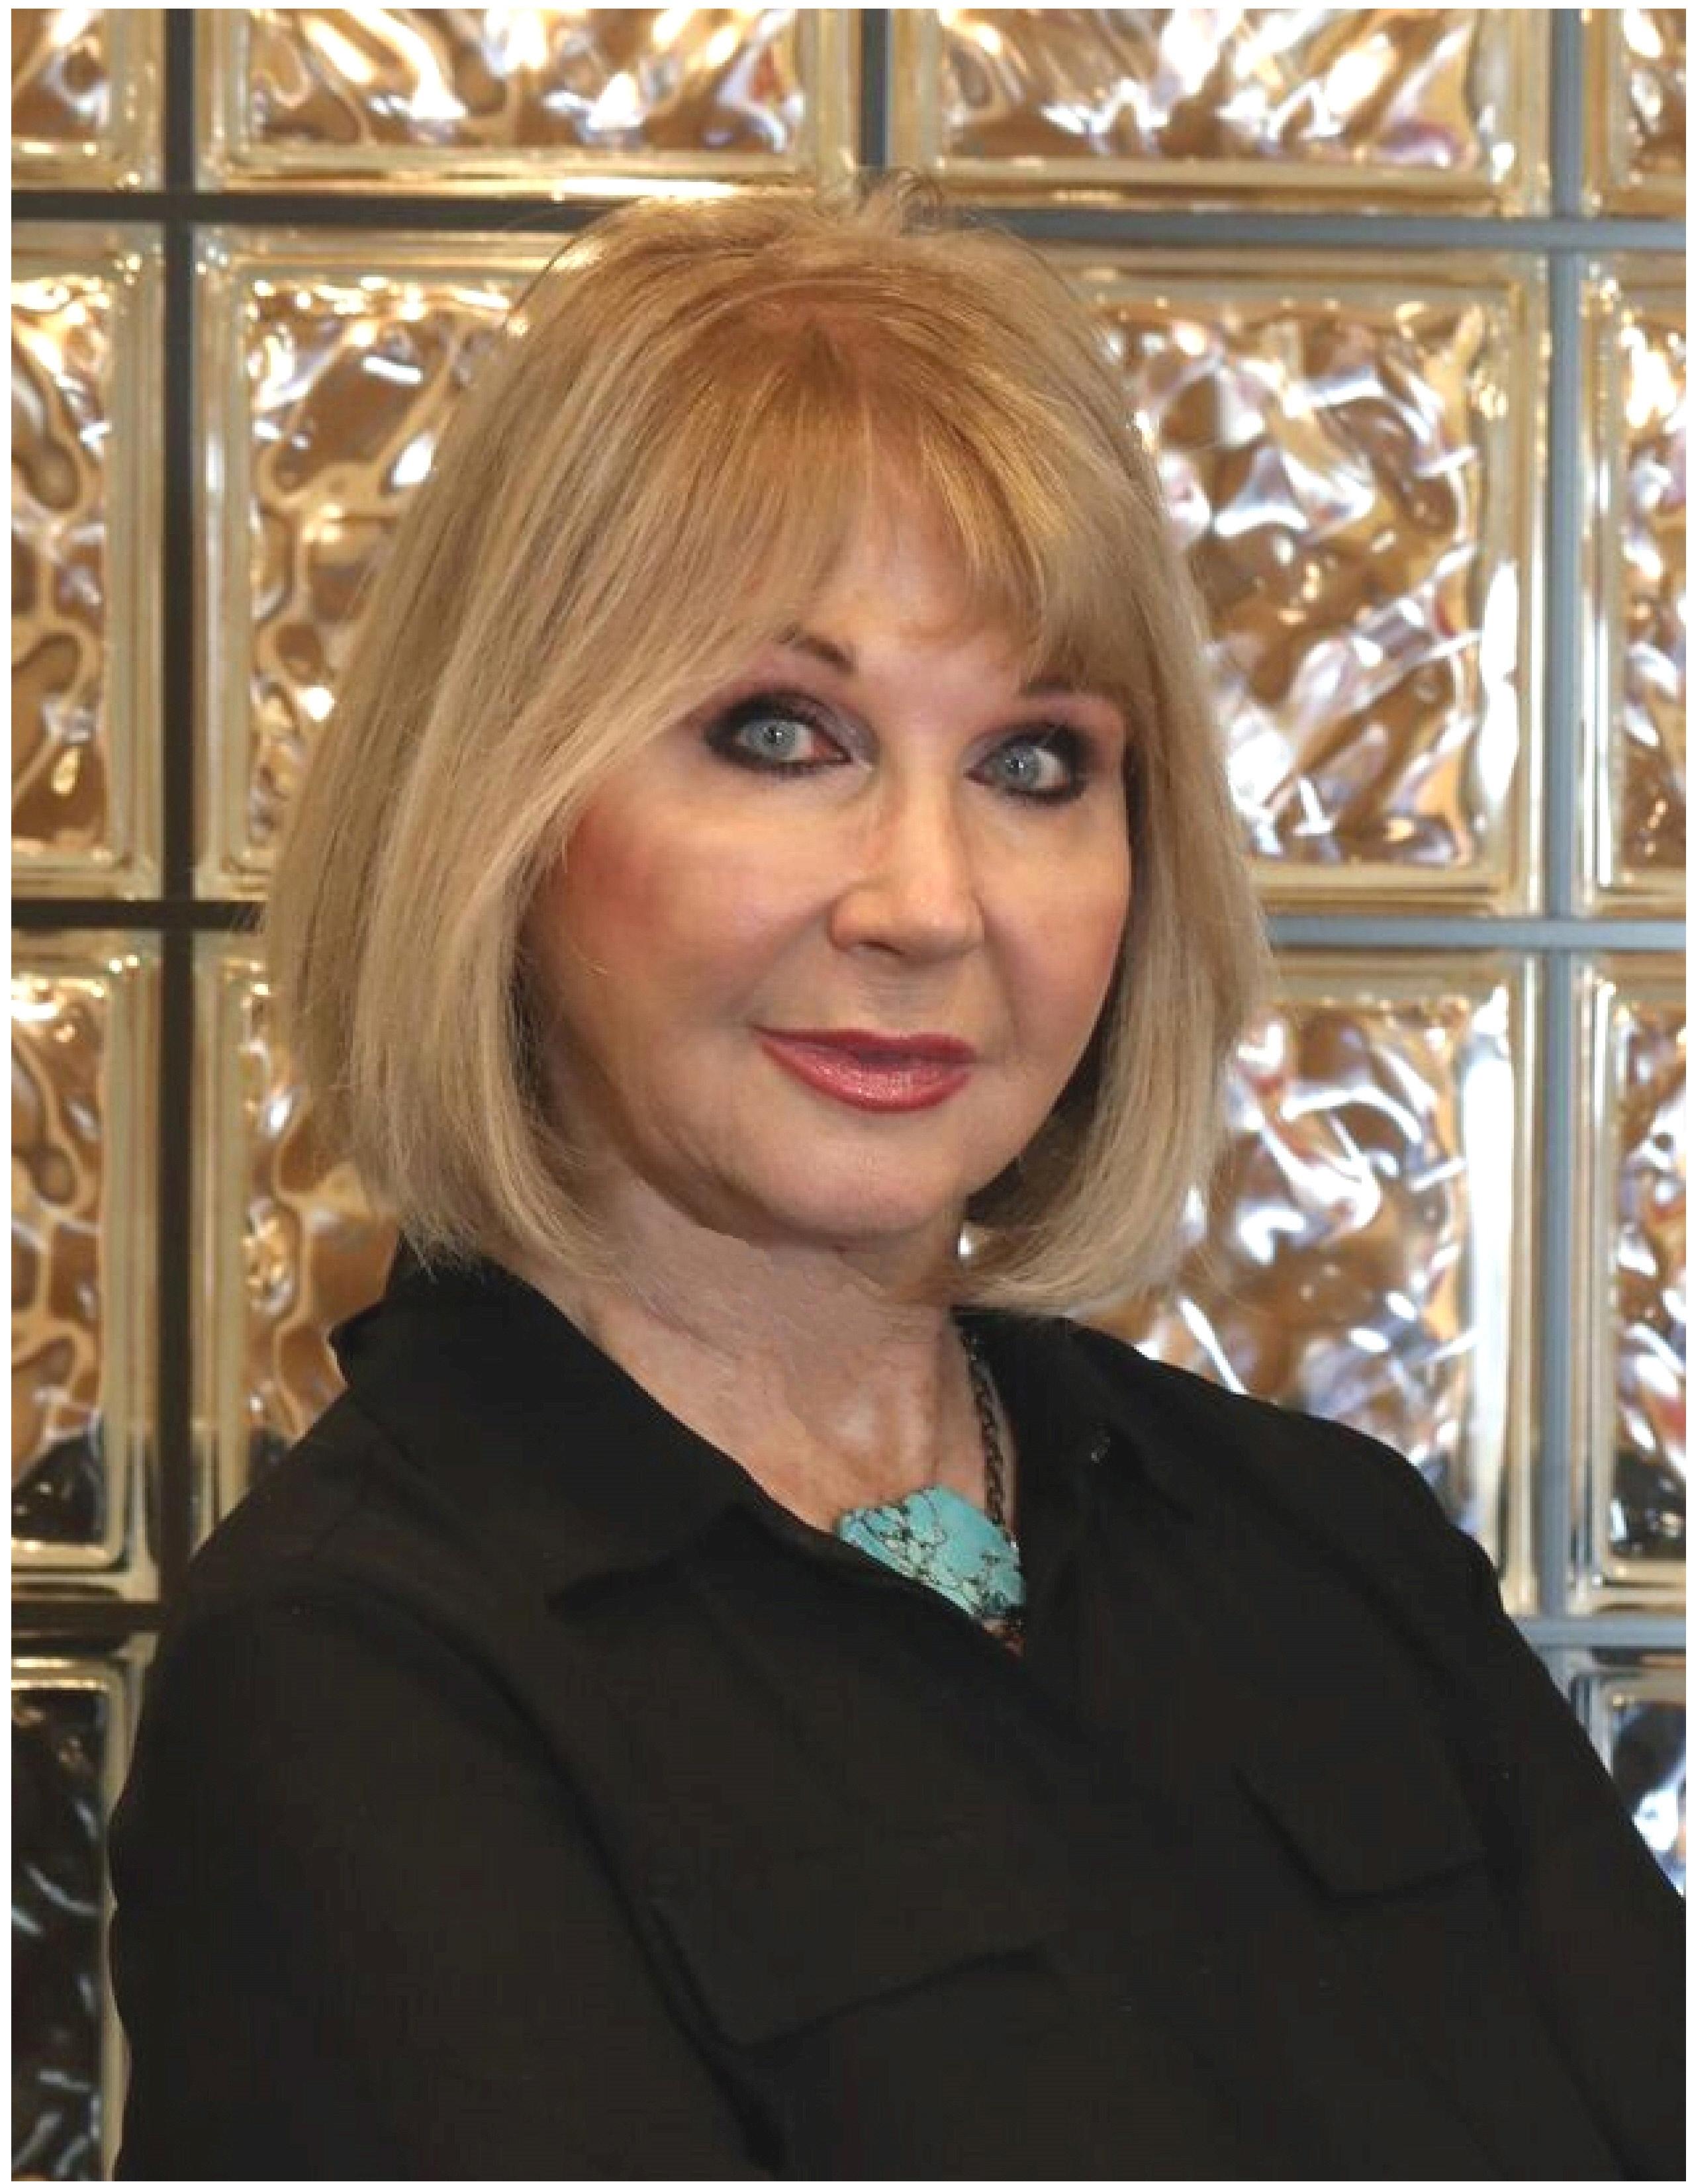 Sheila Zaricor-Wilson, president-elect of Intercoiffure America/Canada.